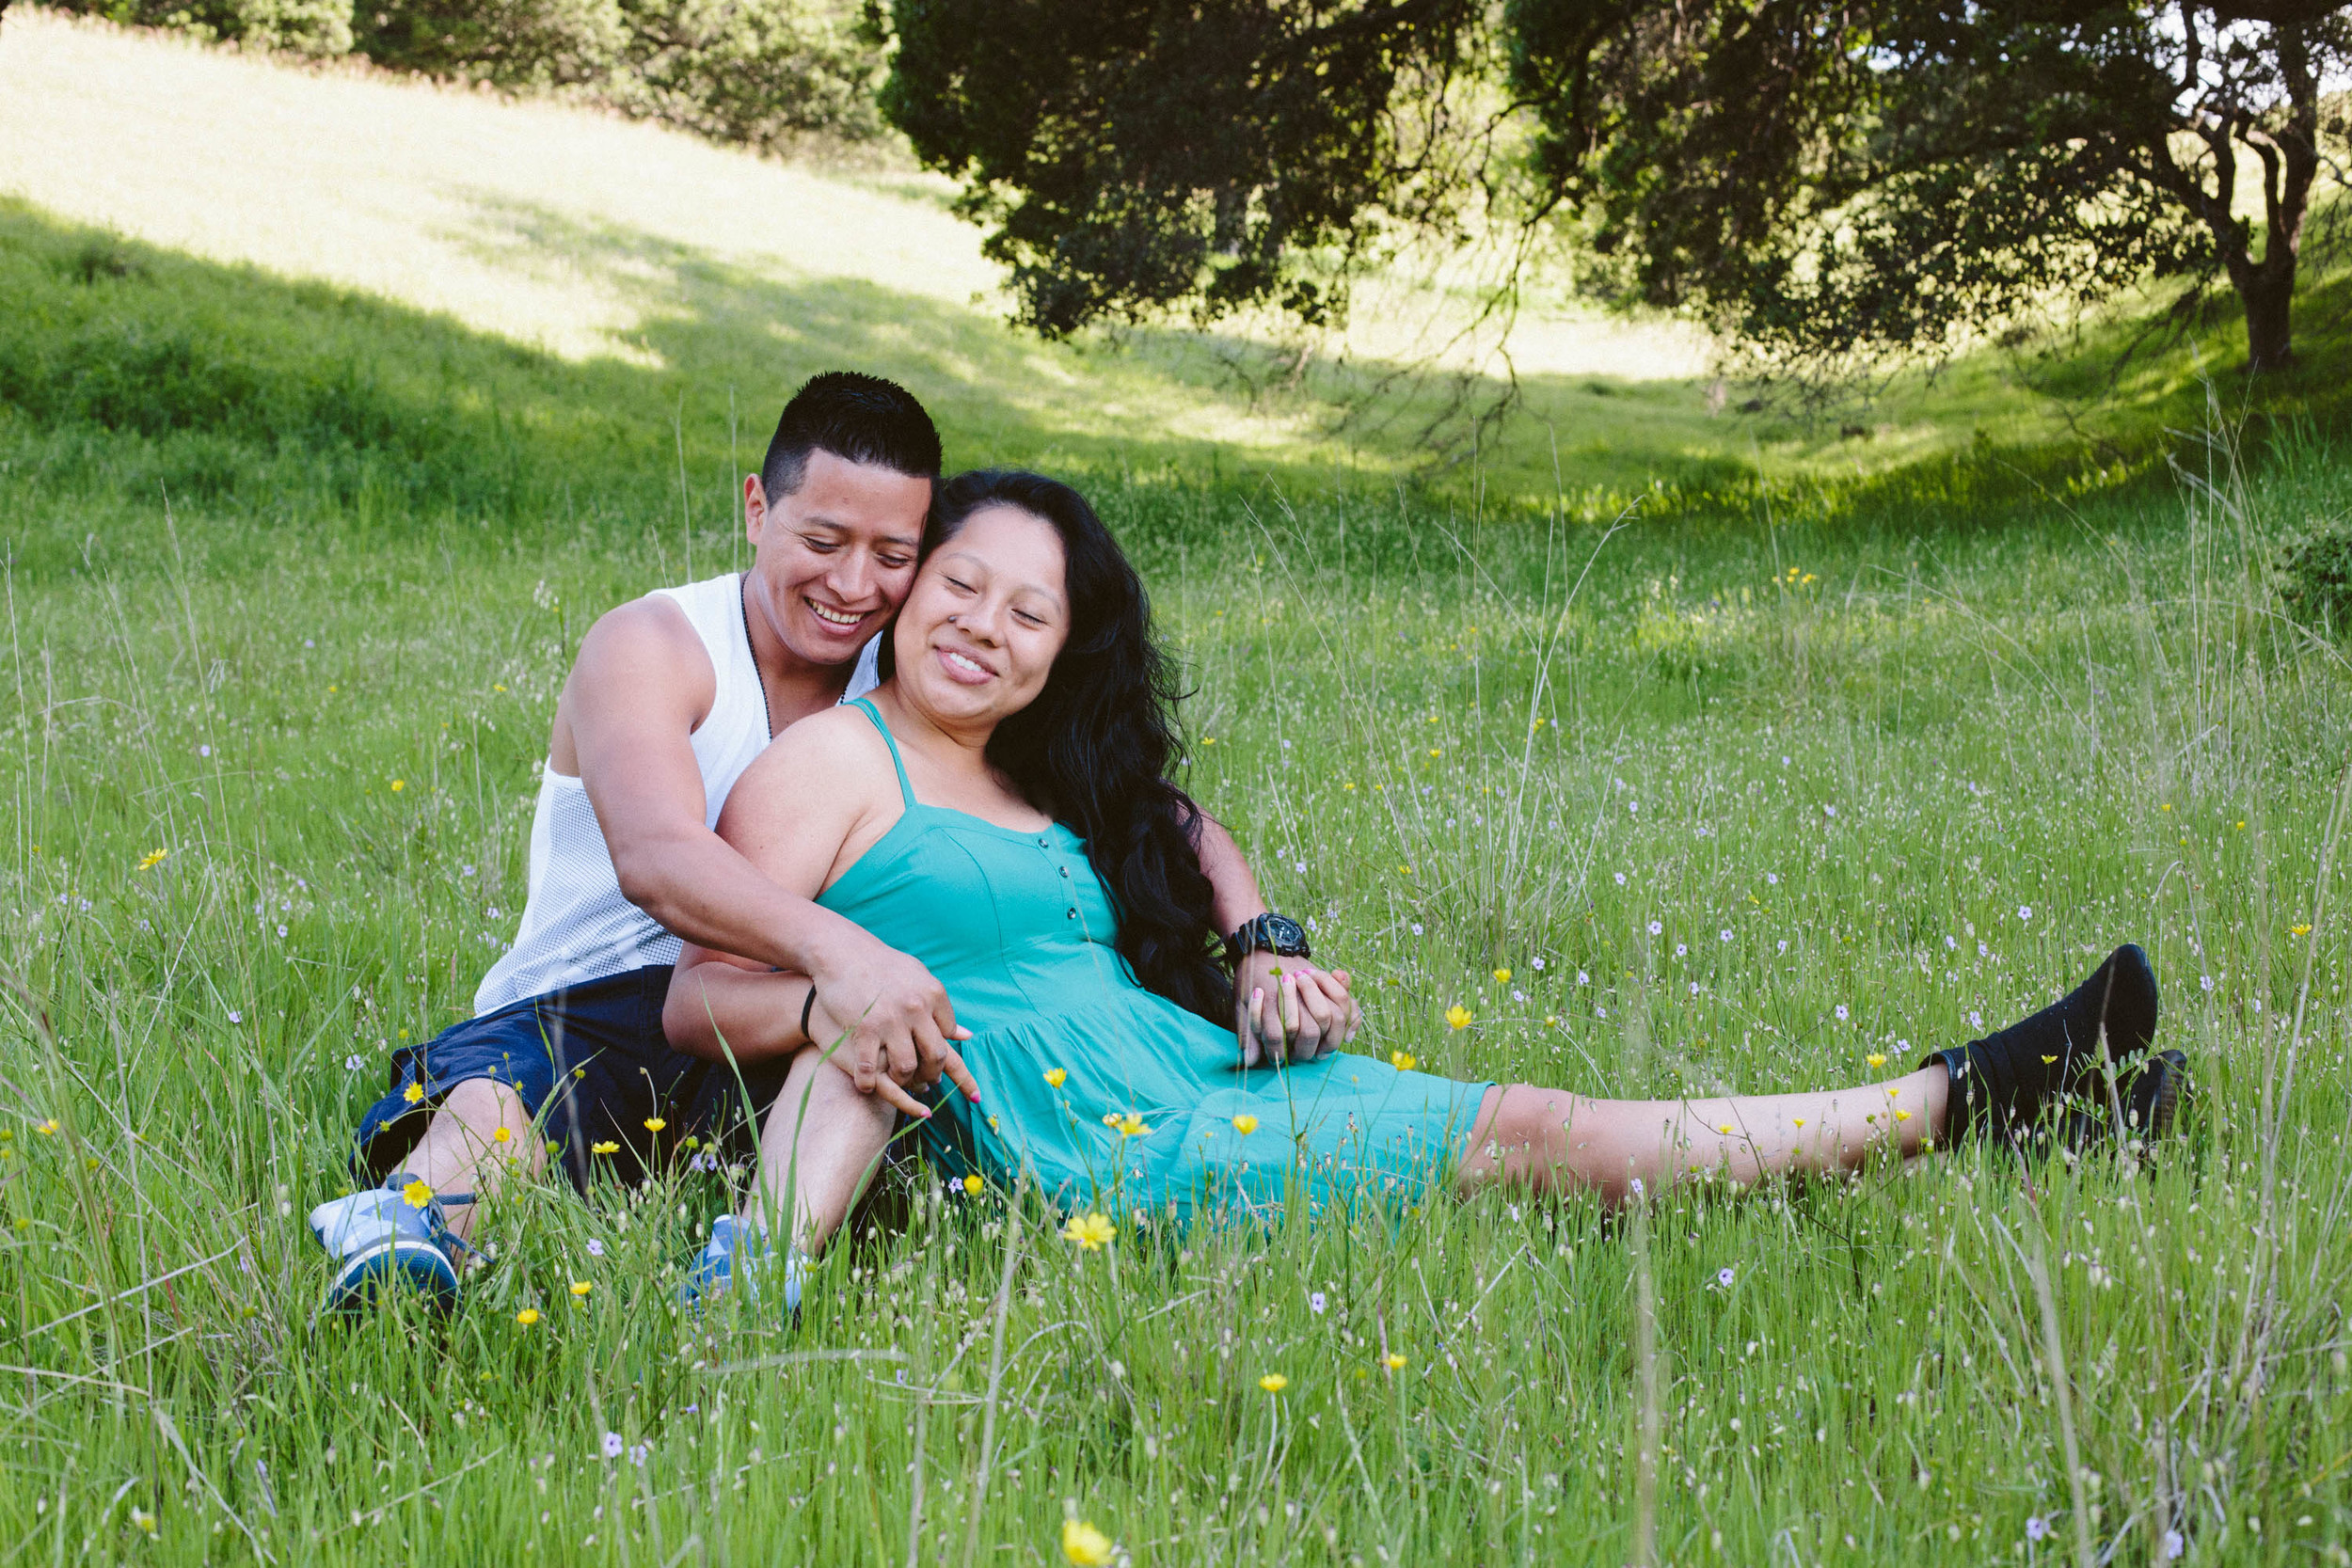 Marin Portrait Photography  Couple  Marin County  Family Photography